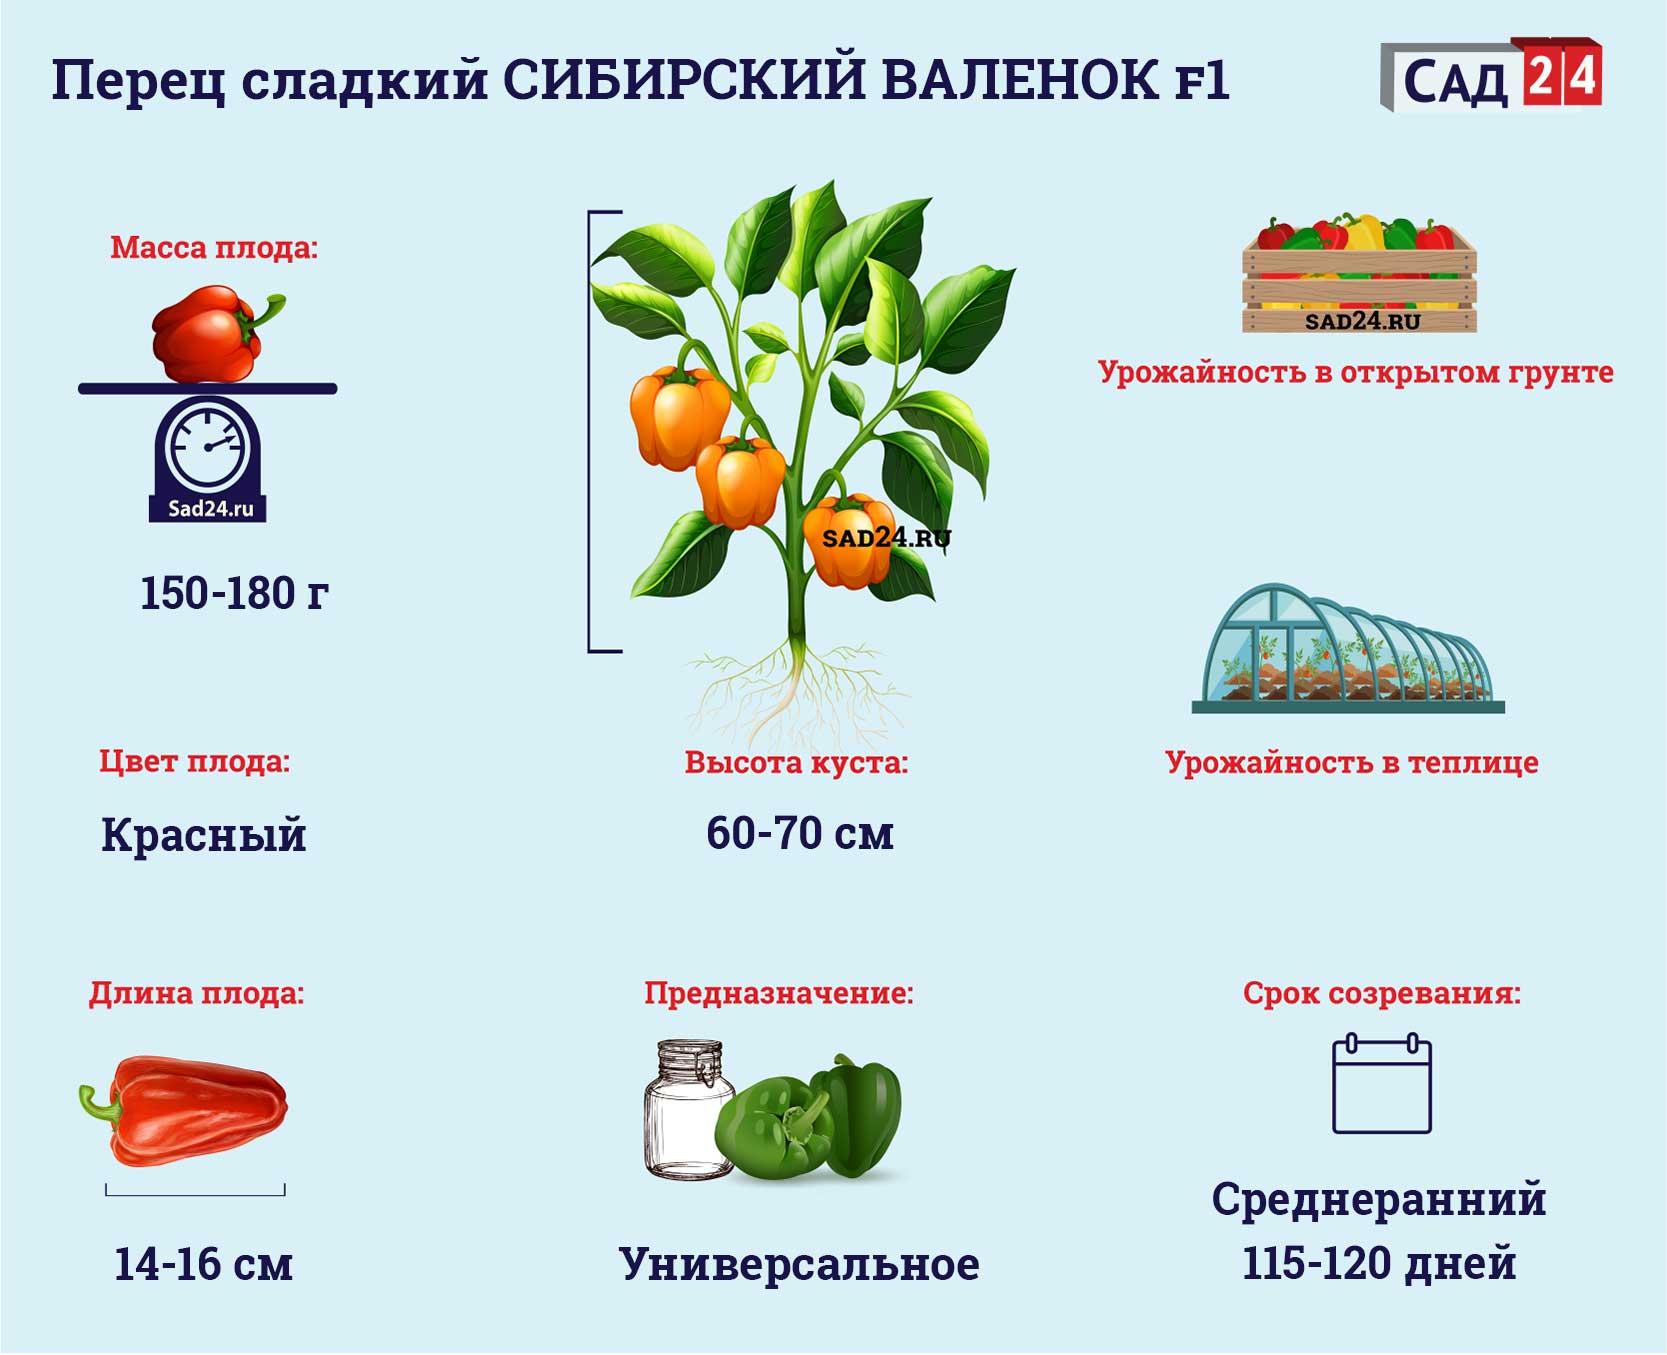 Сибирский валенок F1 https://sad24.ru